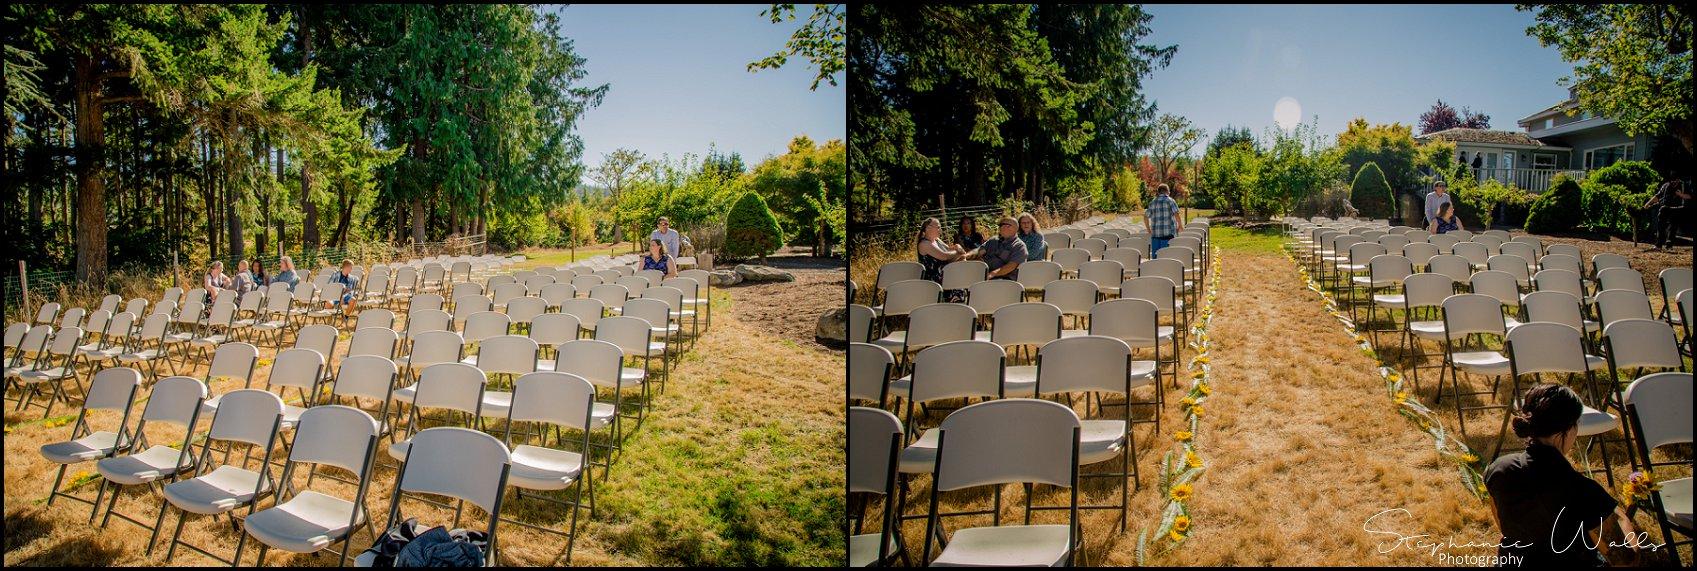 Everist Wedding 025 Patti & Bobbys | Troll Haven Castle & Bandy Farms | Sequim, Wa Wedding Photographer